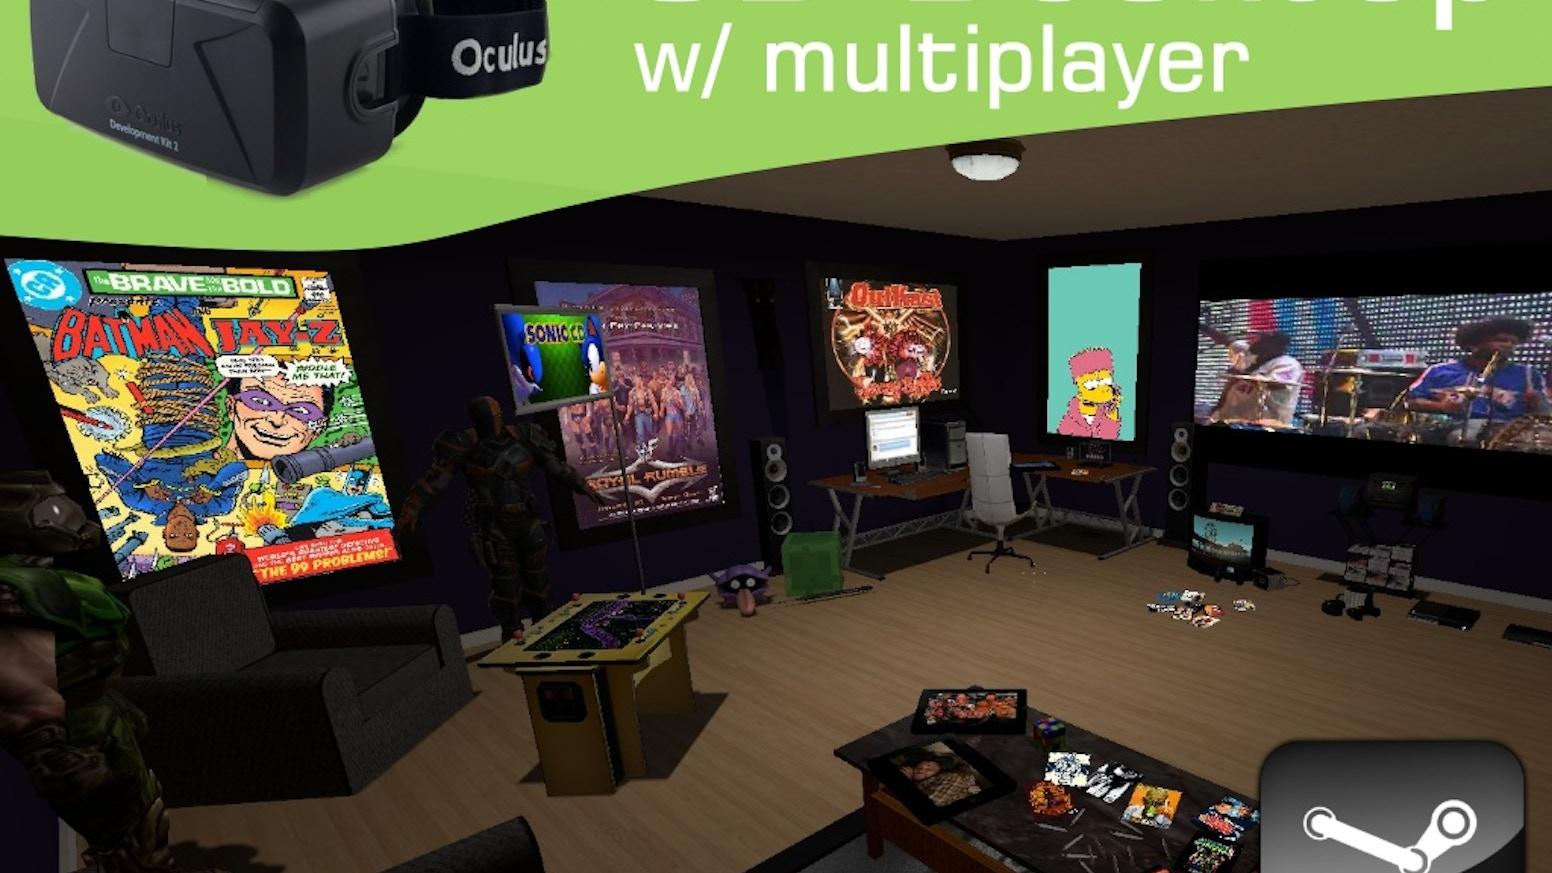 3D VR Desktop & Multiplayer Web w/ Oculus: Anarchy Arcade by